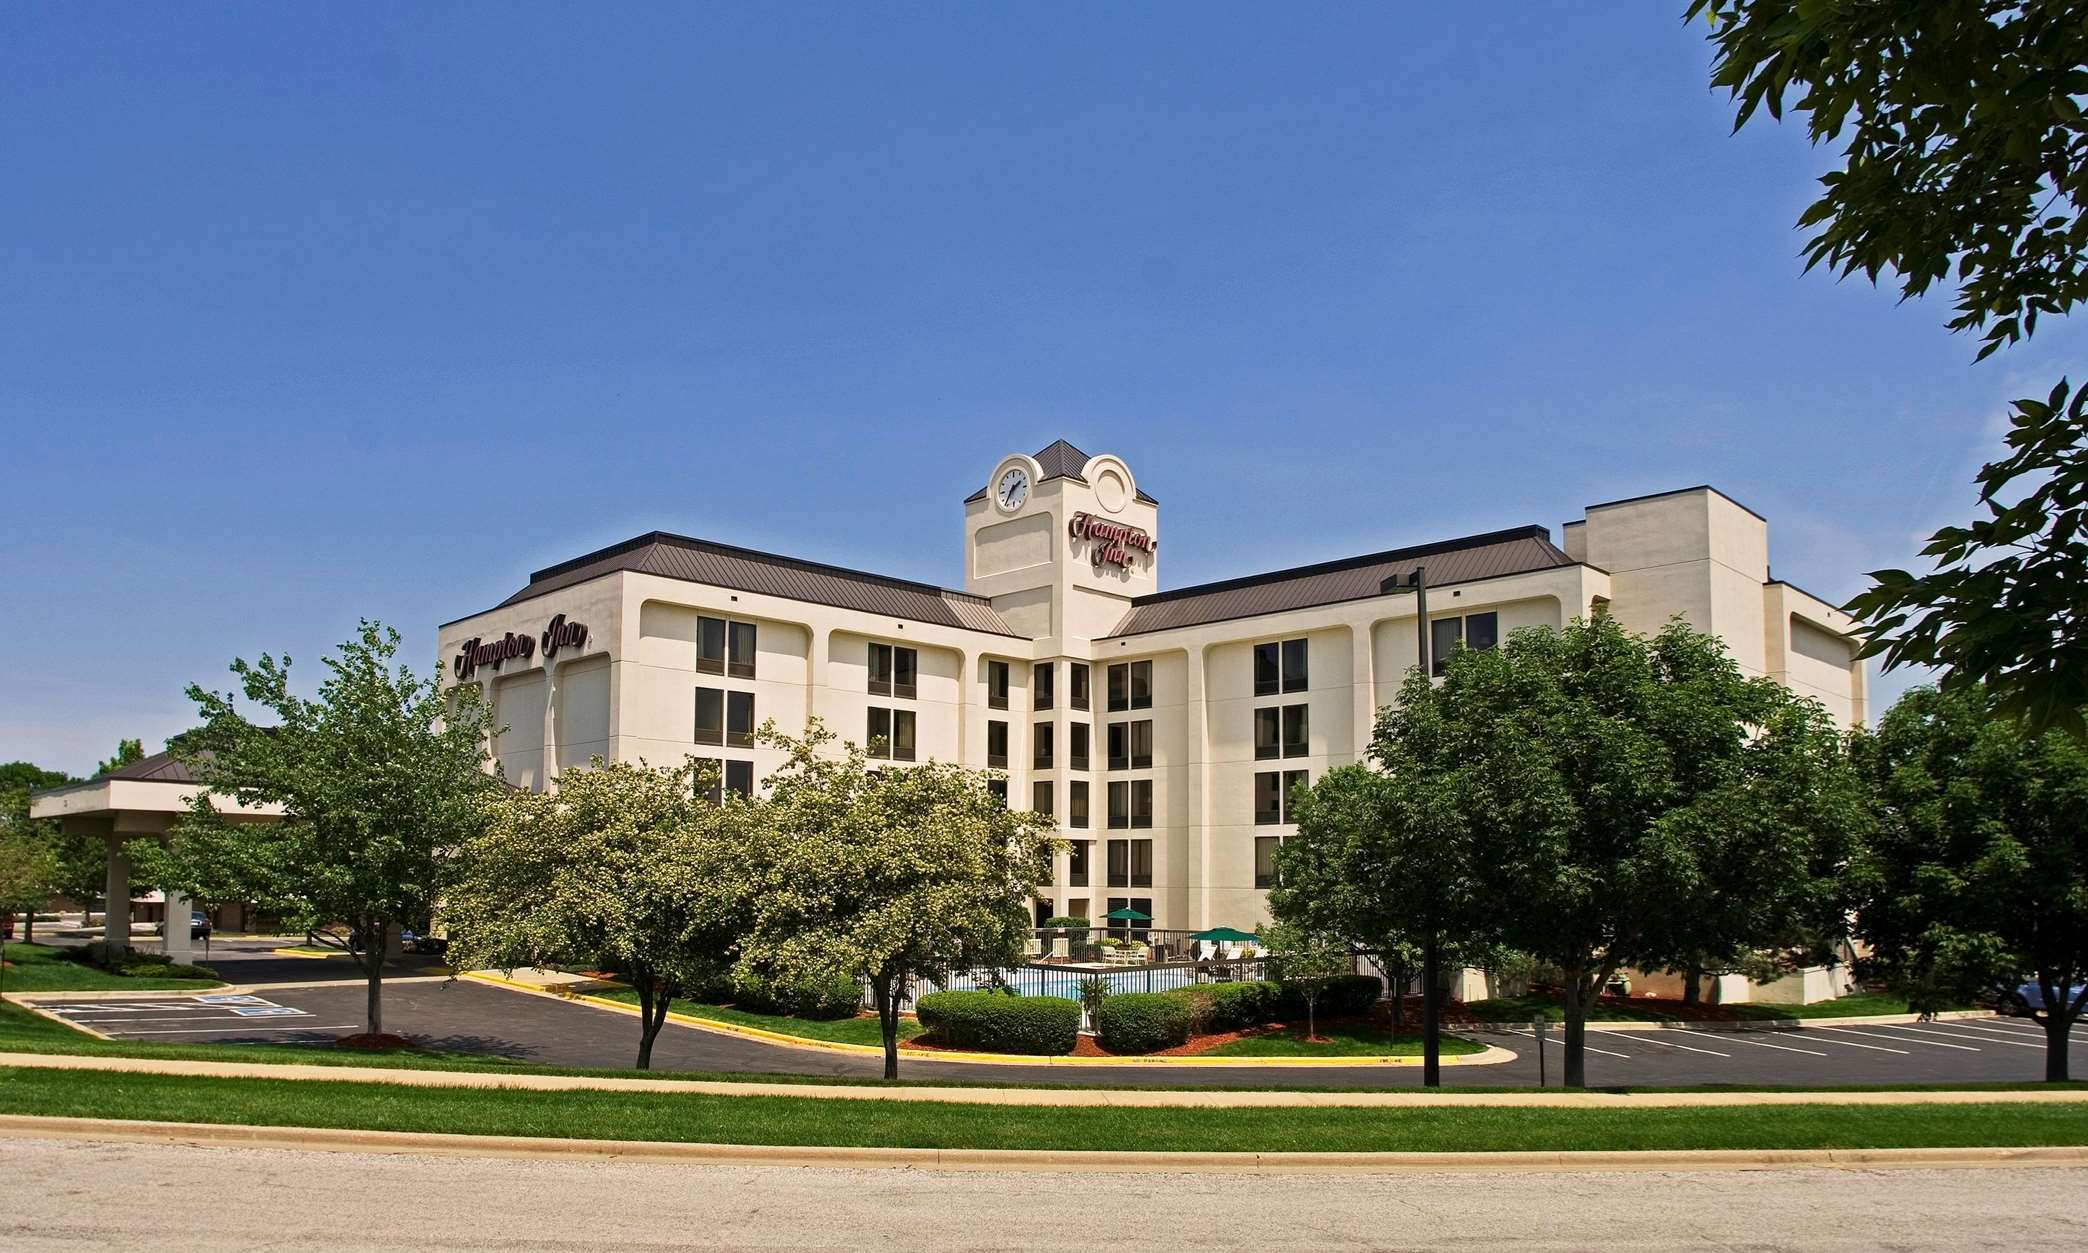 Hampton Inn Kansas City/Overland Park image 0